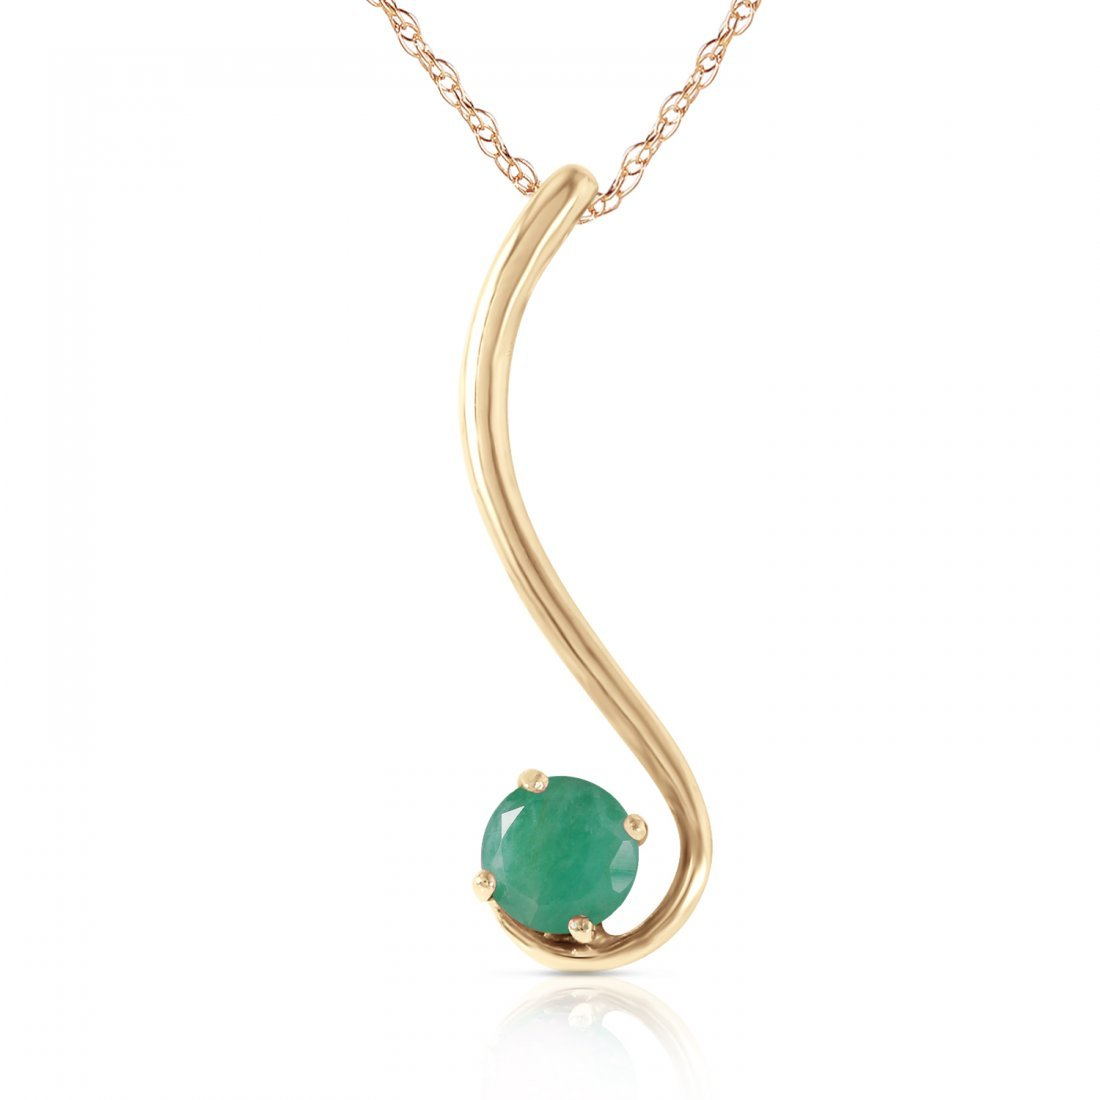 Genuine 0.55 ctw Emerald Necklace Jewelry 14KT Yellow